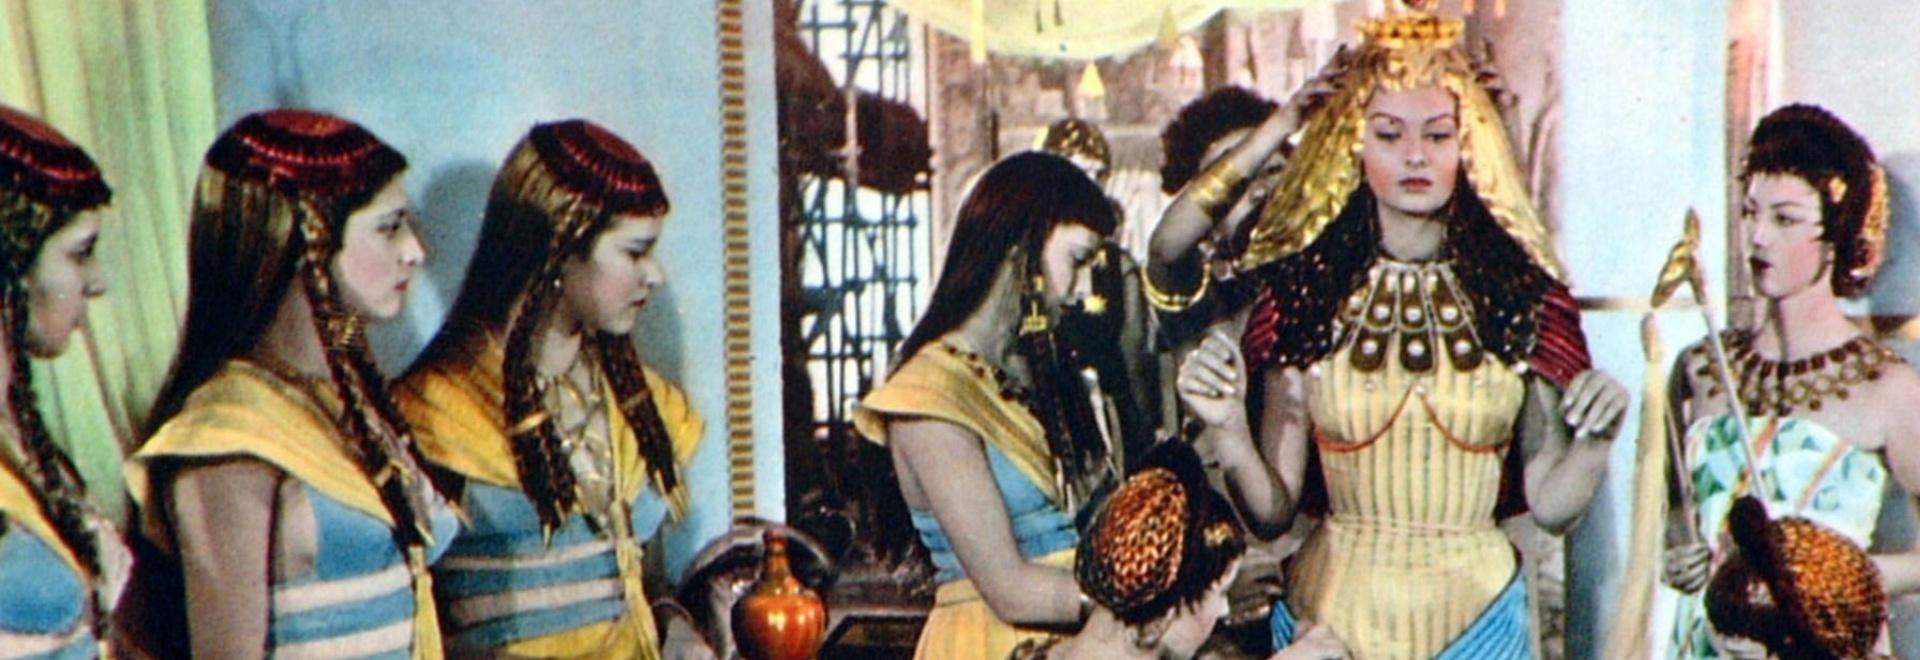 Due notti con Cleopatra